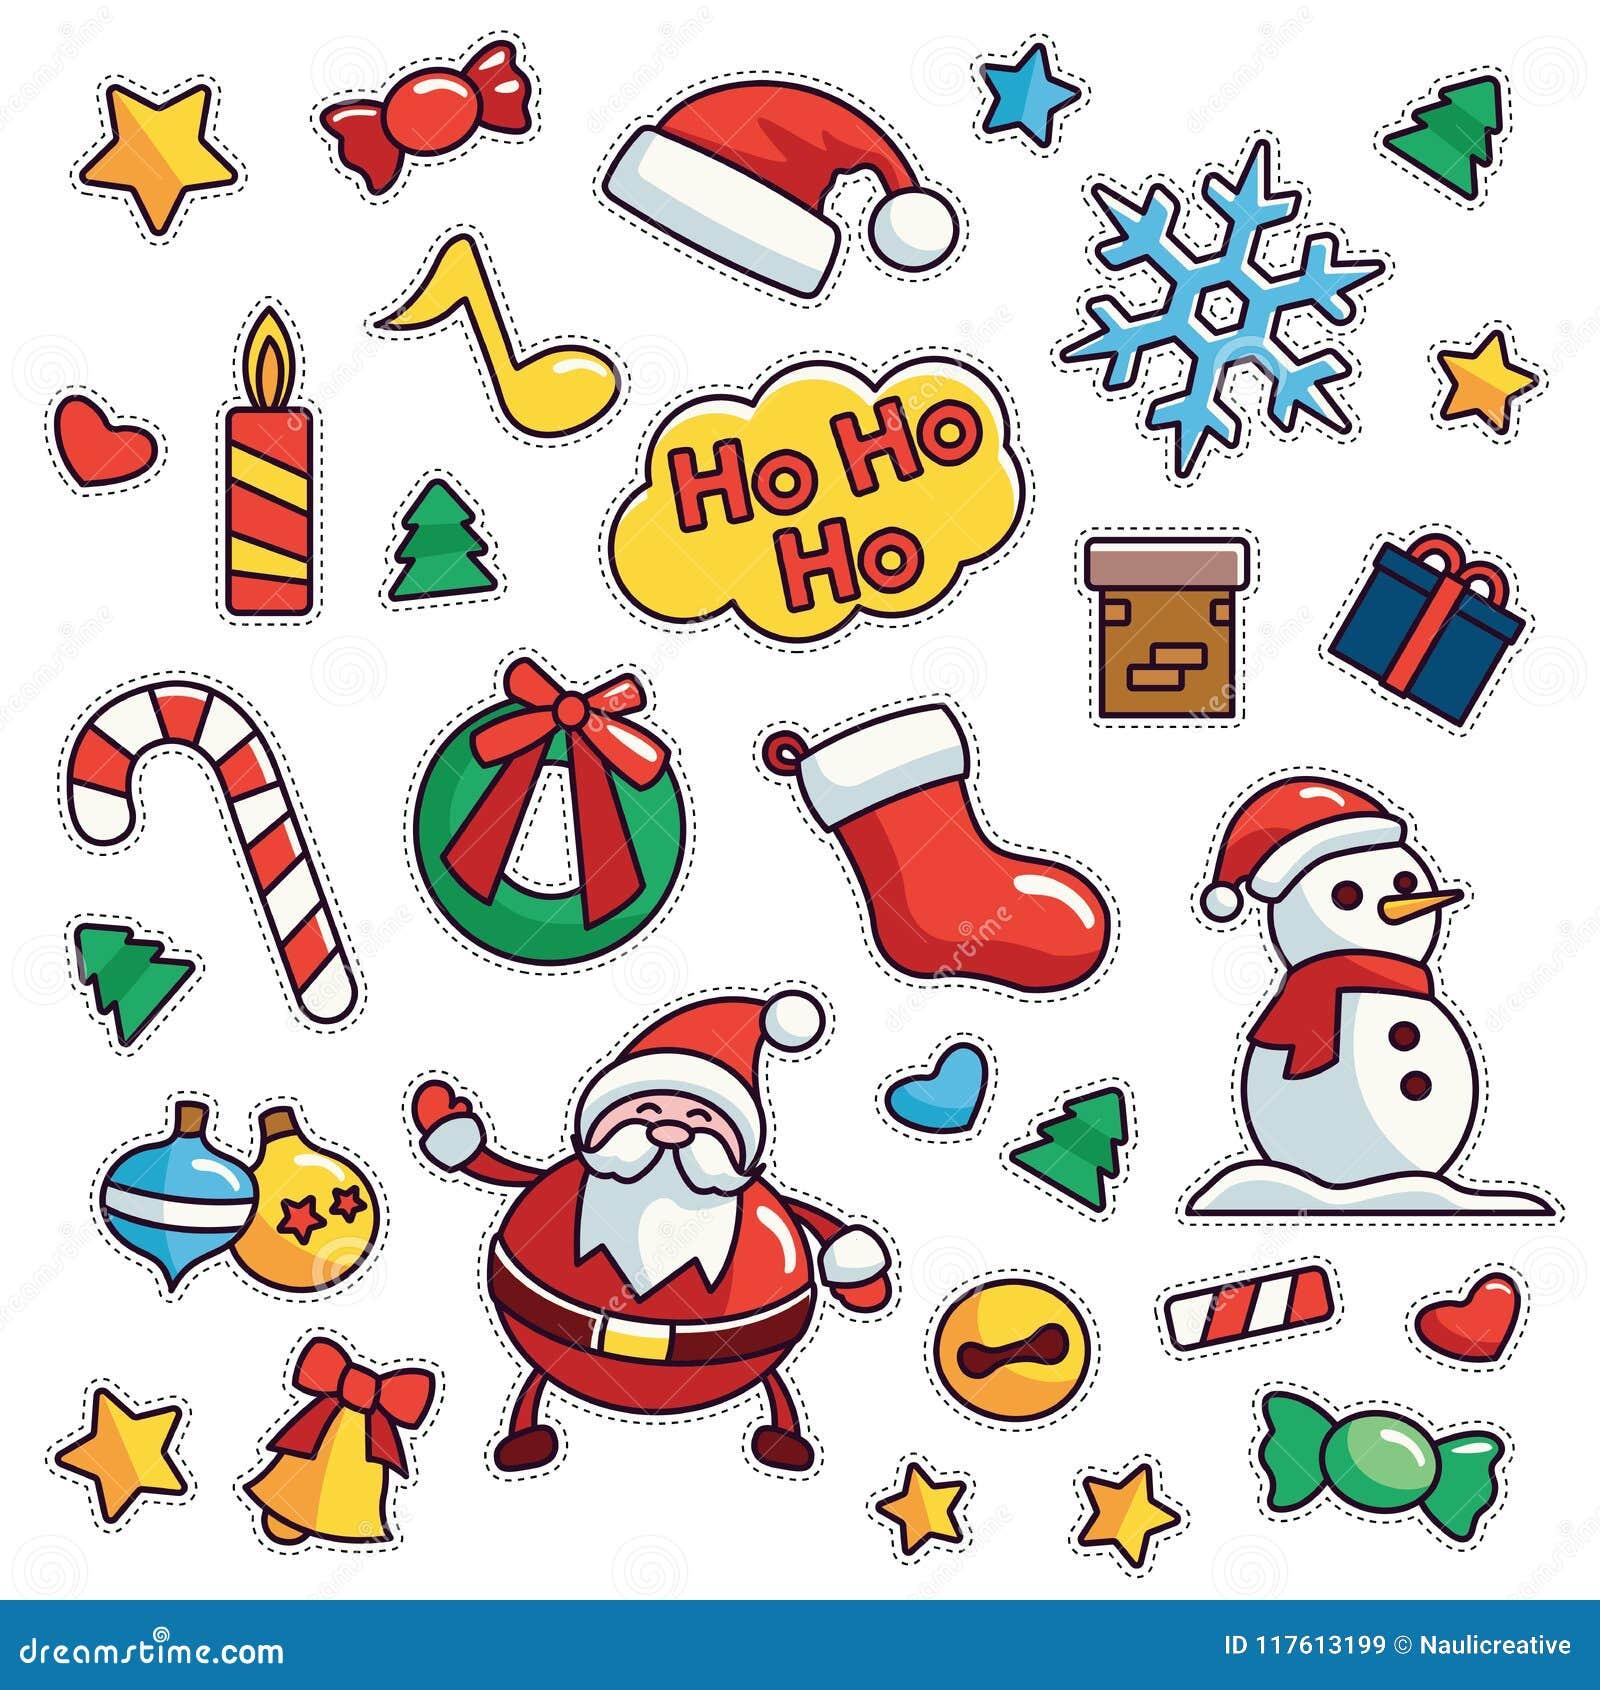 Vintage 80s 90s Merrry Christmas Fashion Cartoon Illustration